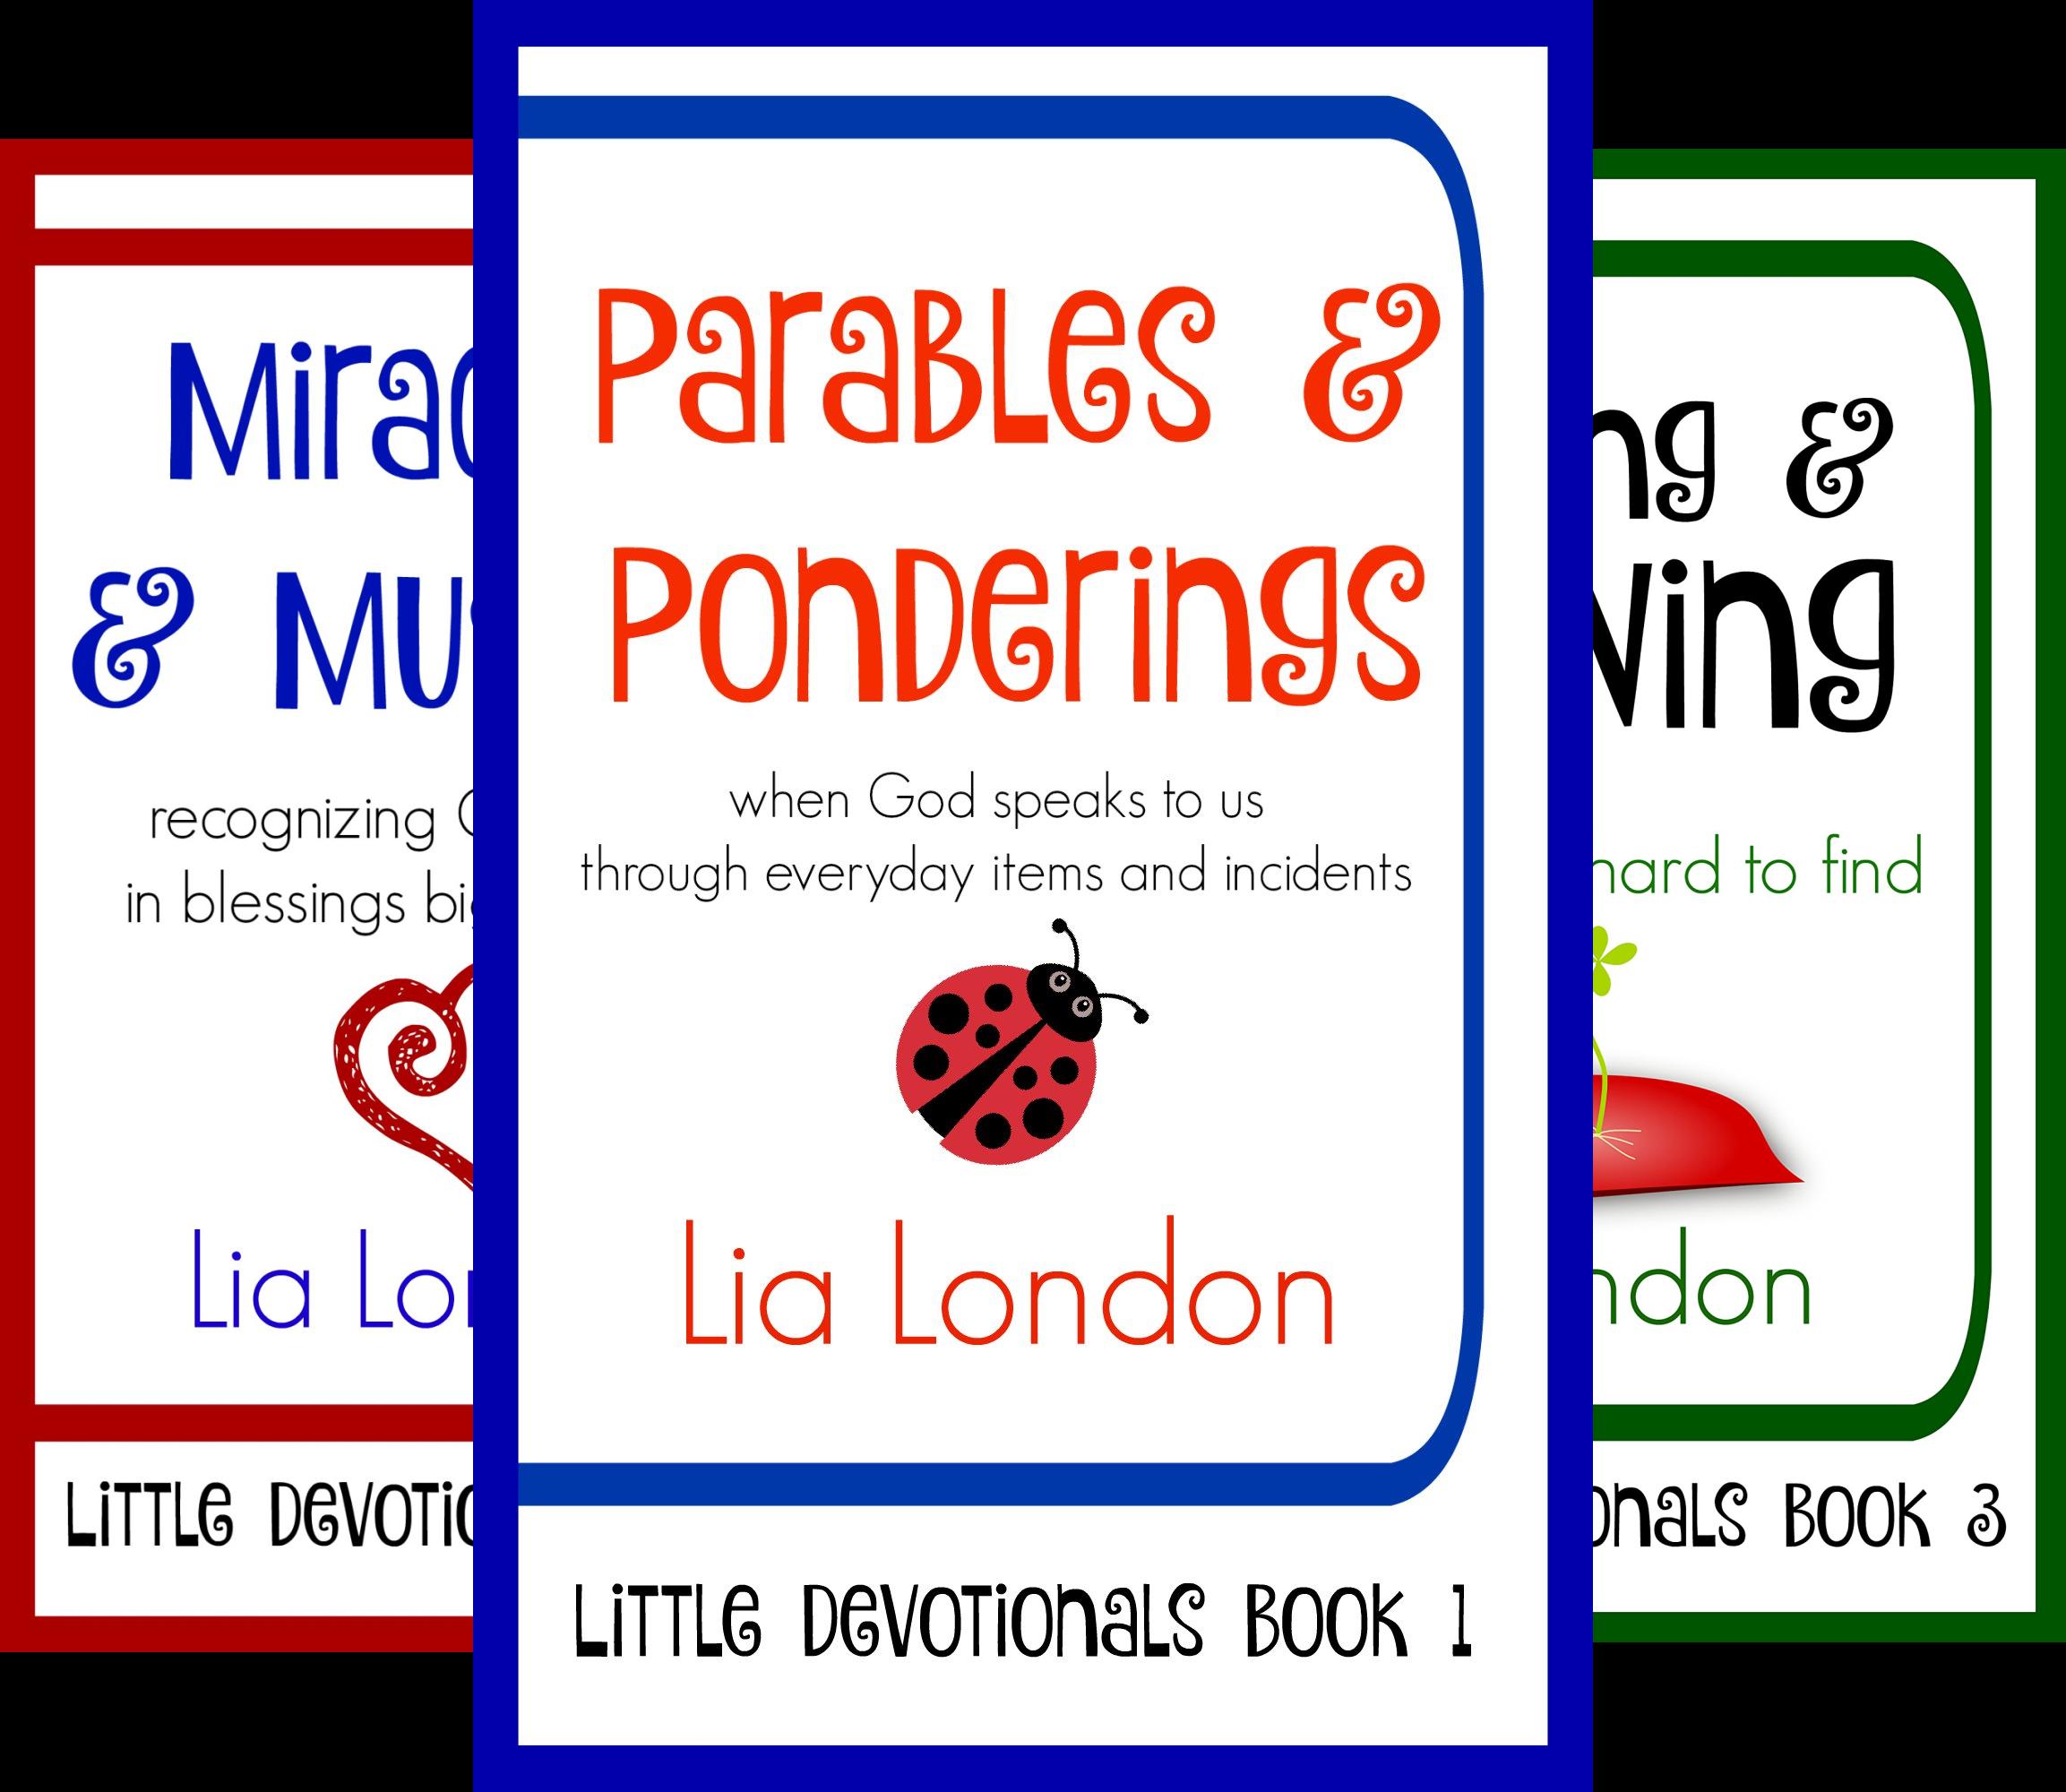 Little Devotionals (3 Book Series)